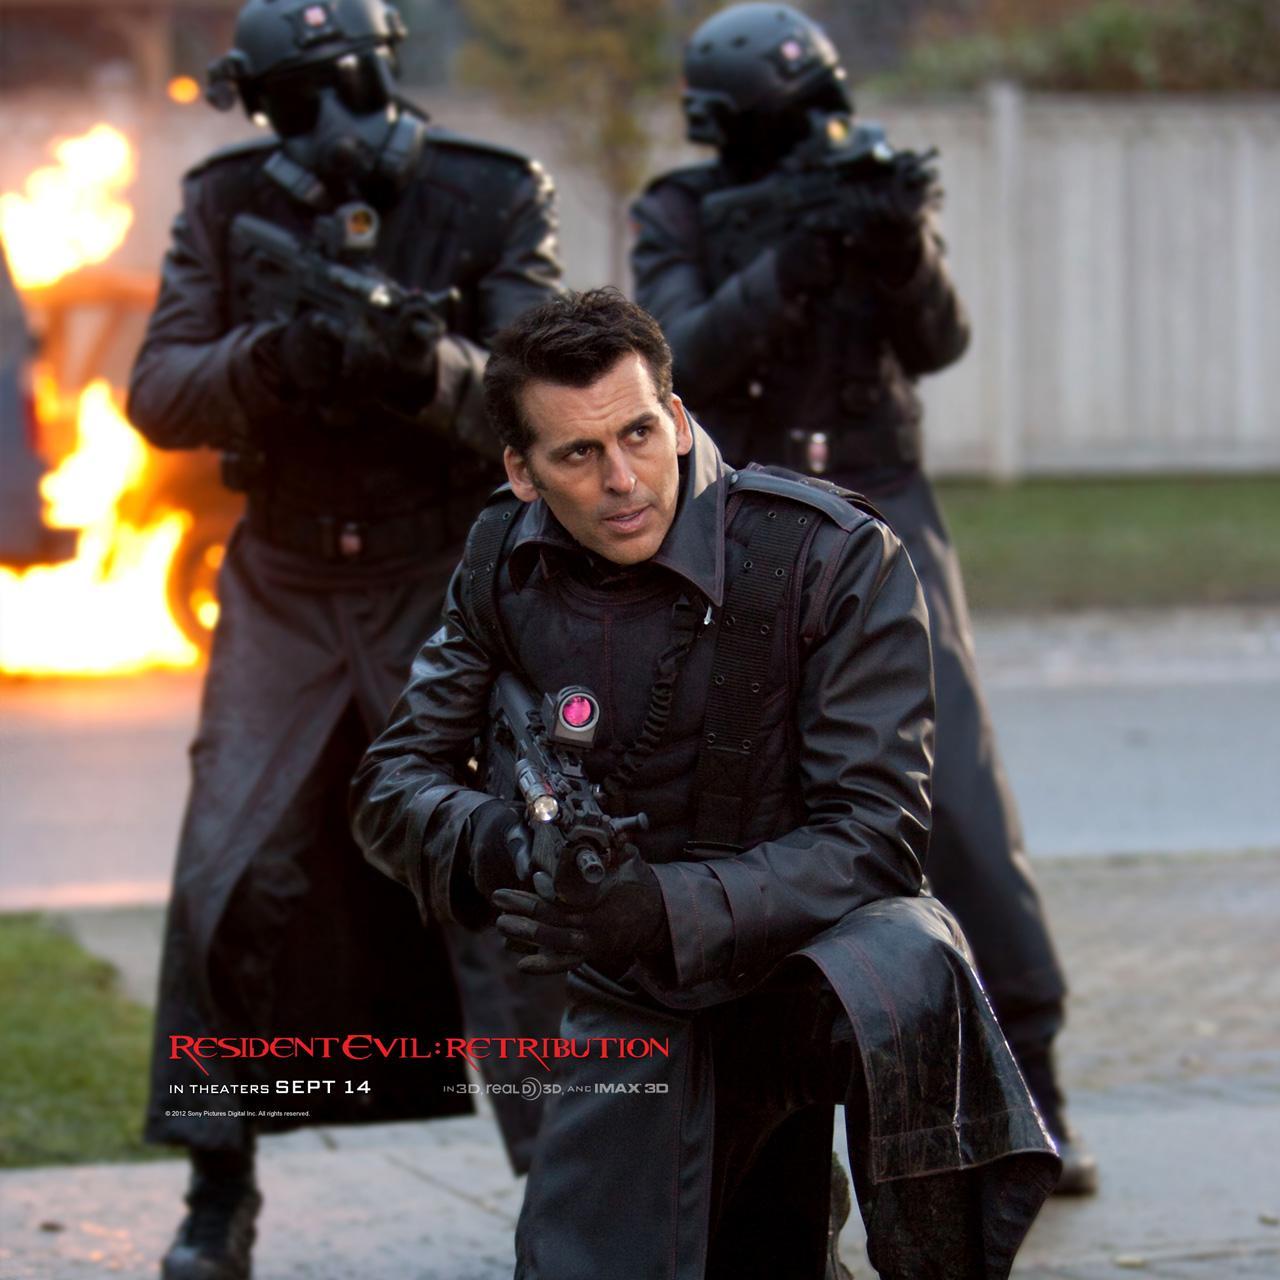 http://4.bp.blogspot.com/--GWHxWPLPis/UC0zr8pUImI/AAAAAAAAKdk/3nu8yErelOc/s1600/resident-evil-la-venganza-foto-24.jpg